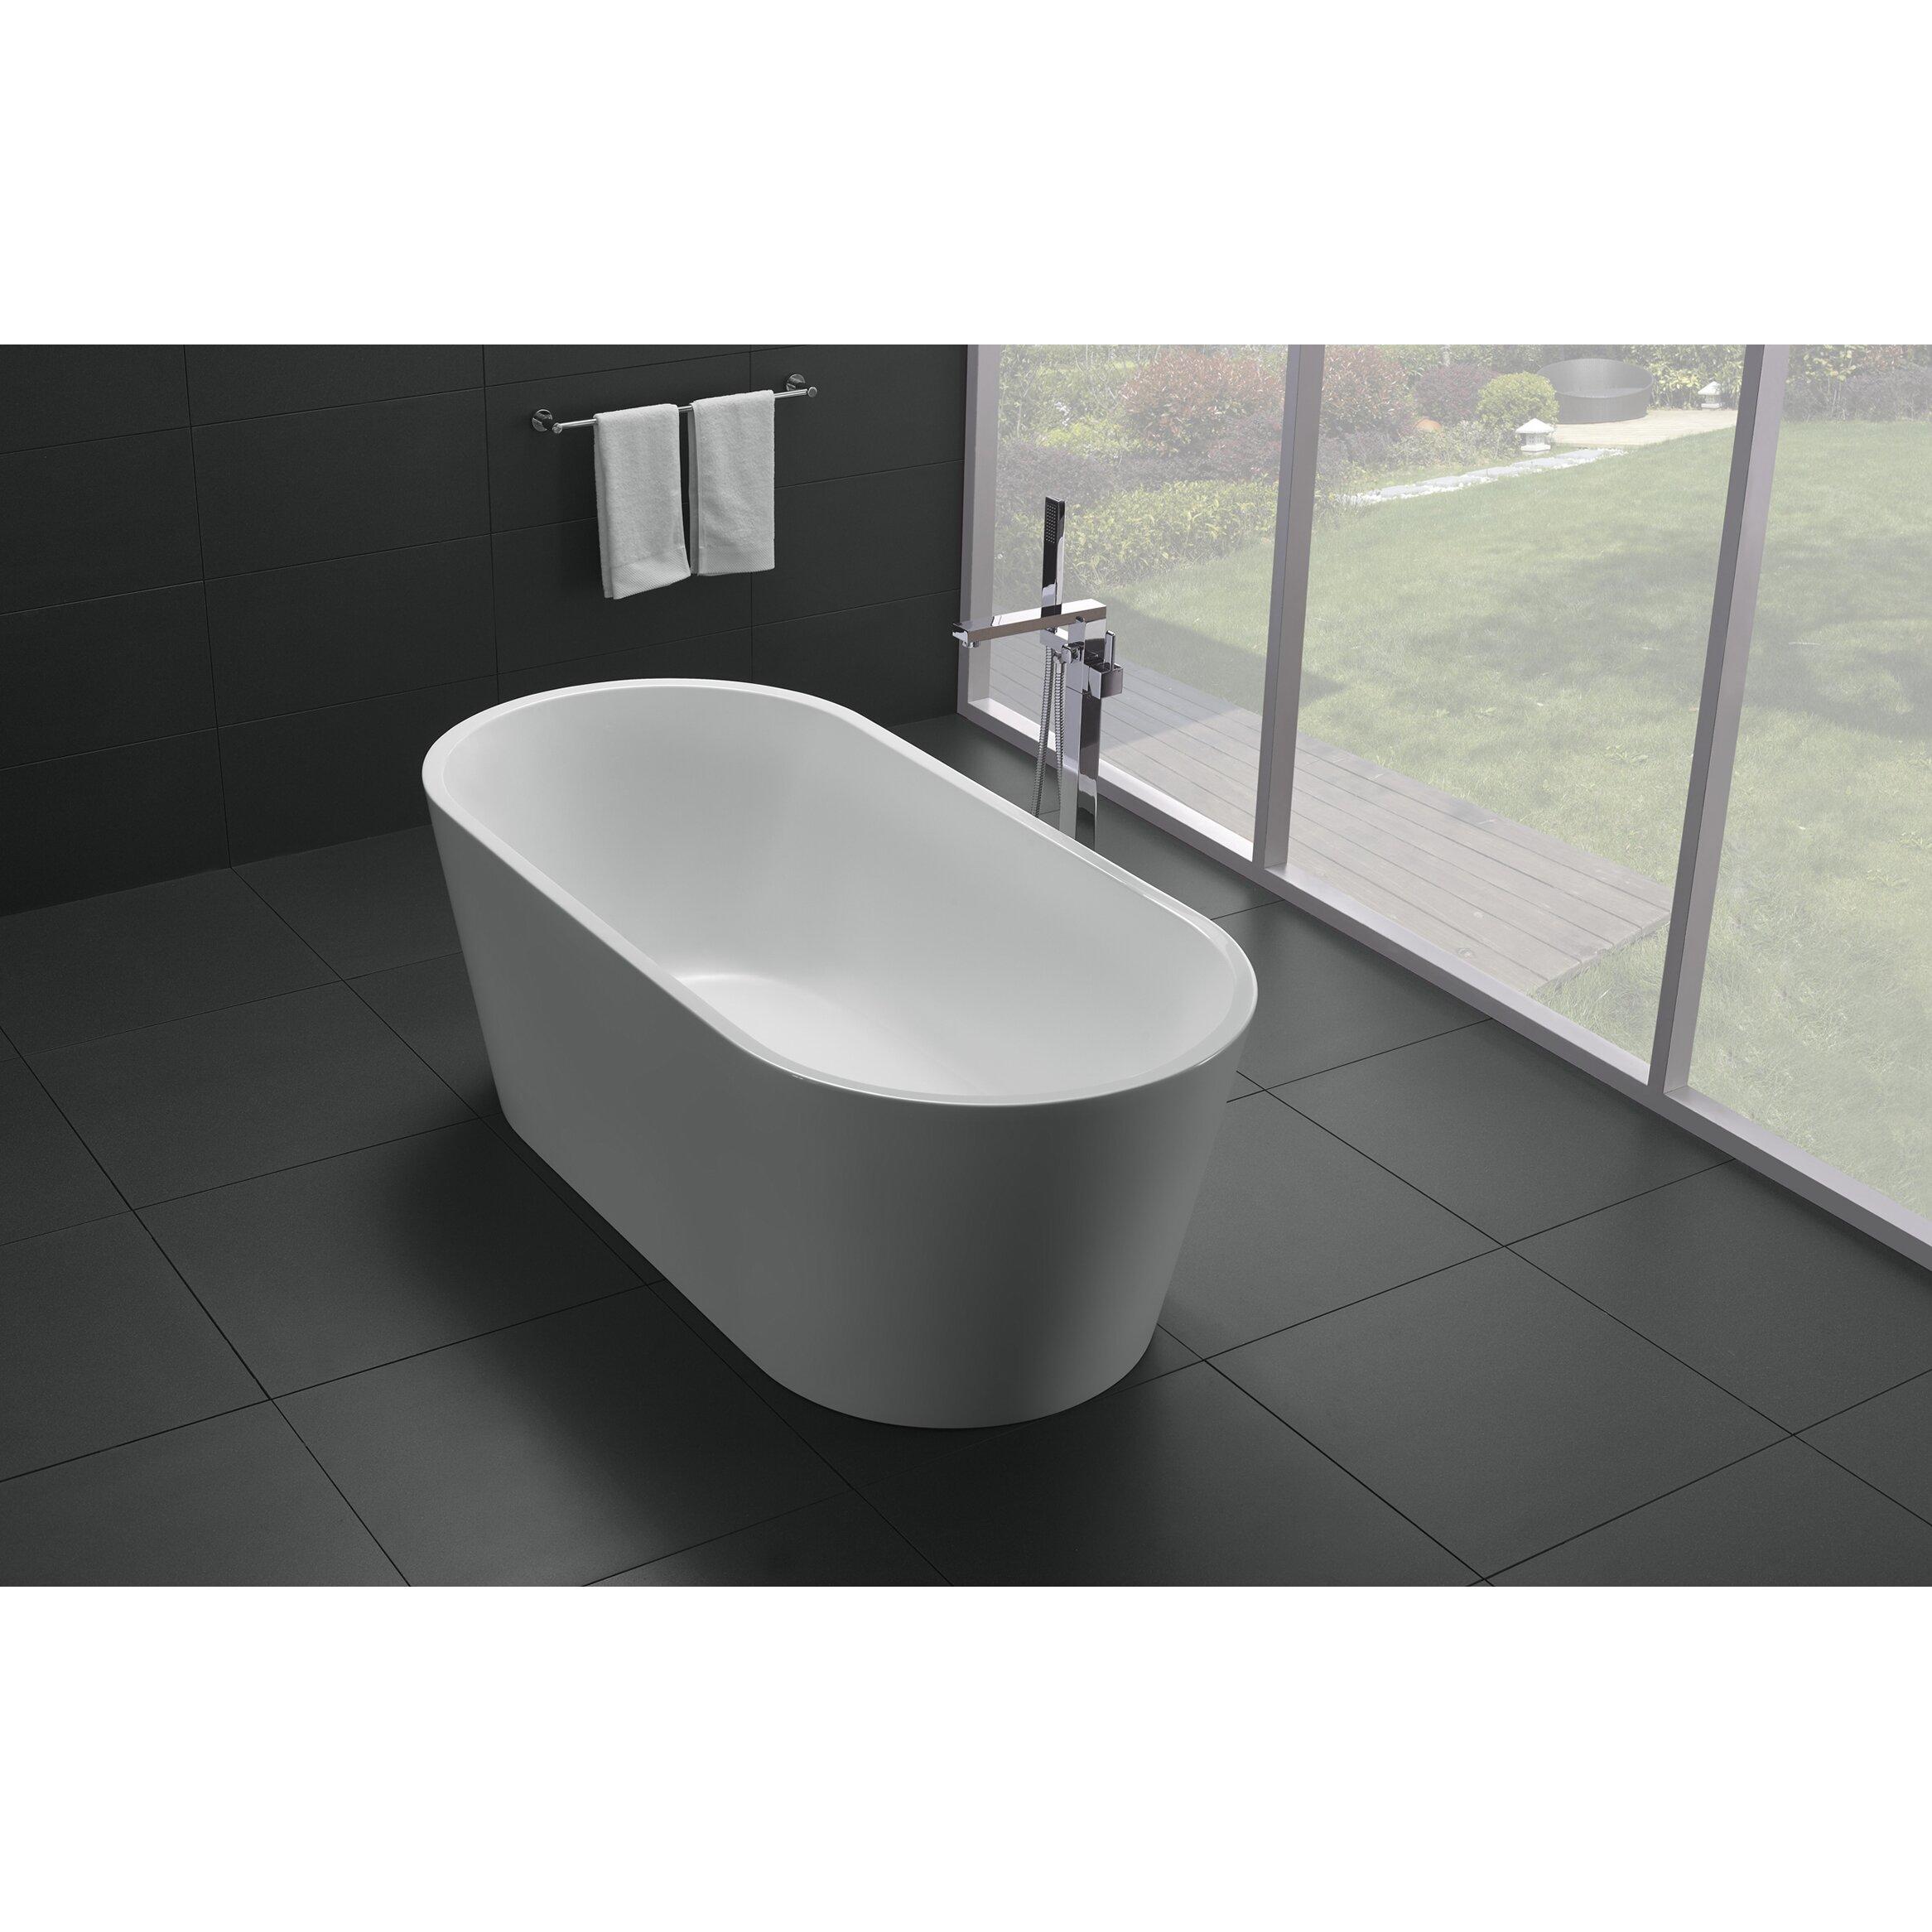 Alexa x 30 bathtub wayfair for Best acrylic bathtub to buy